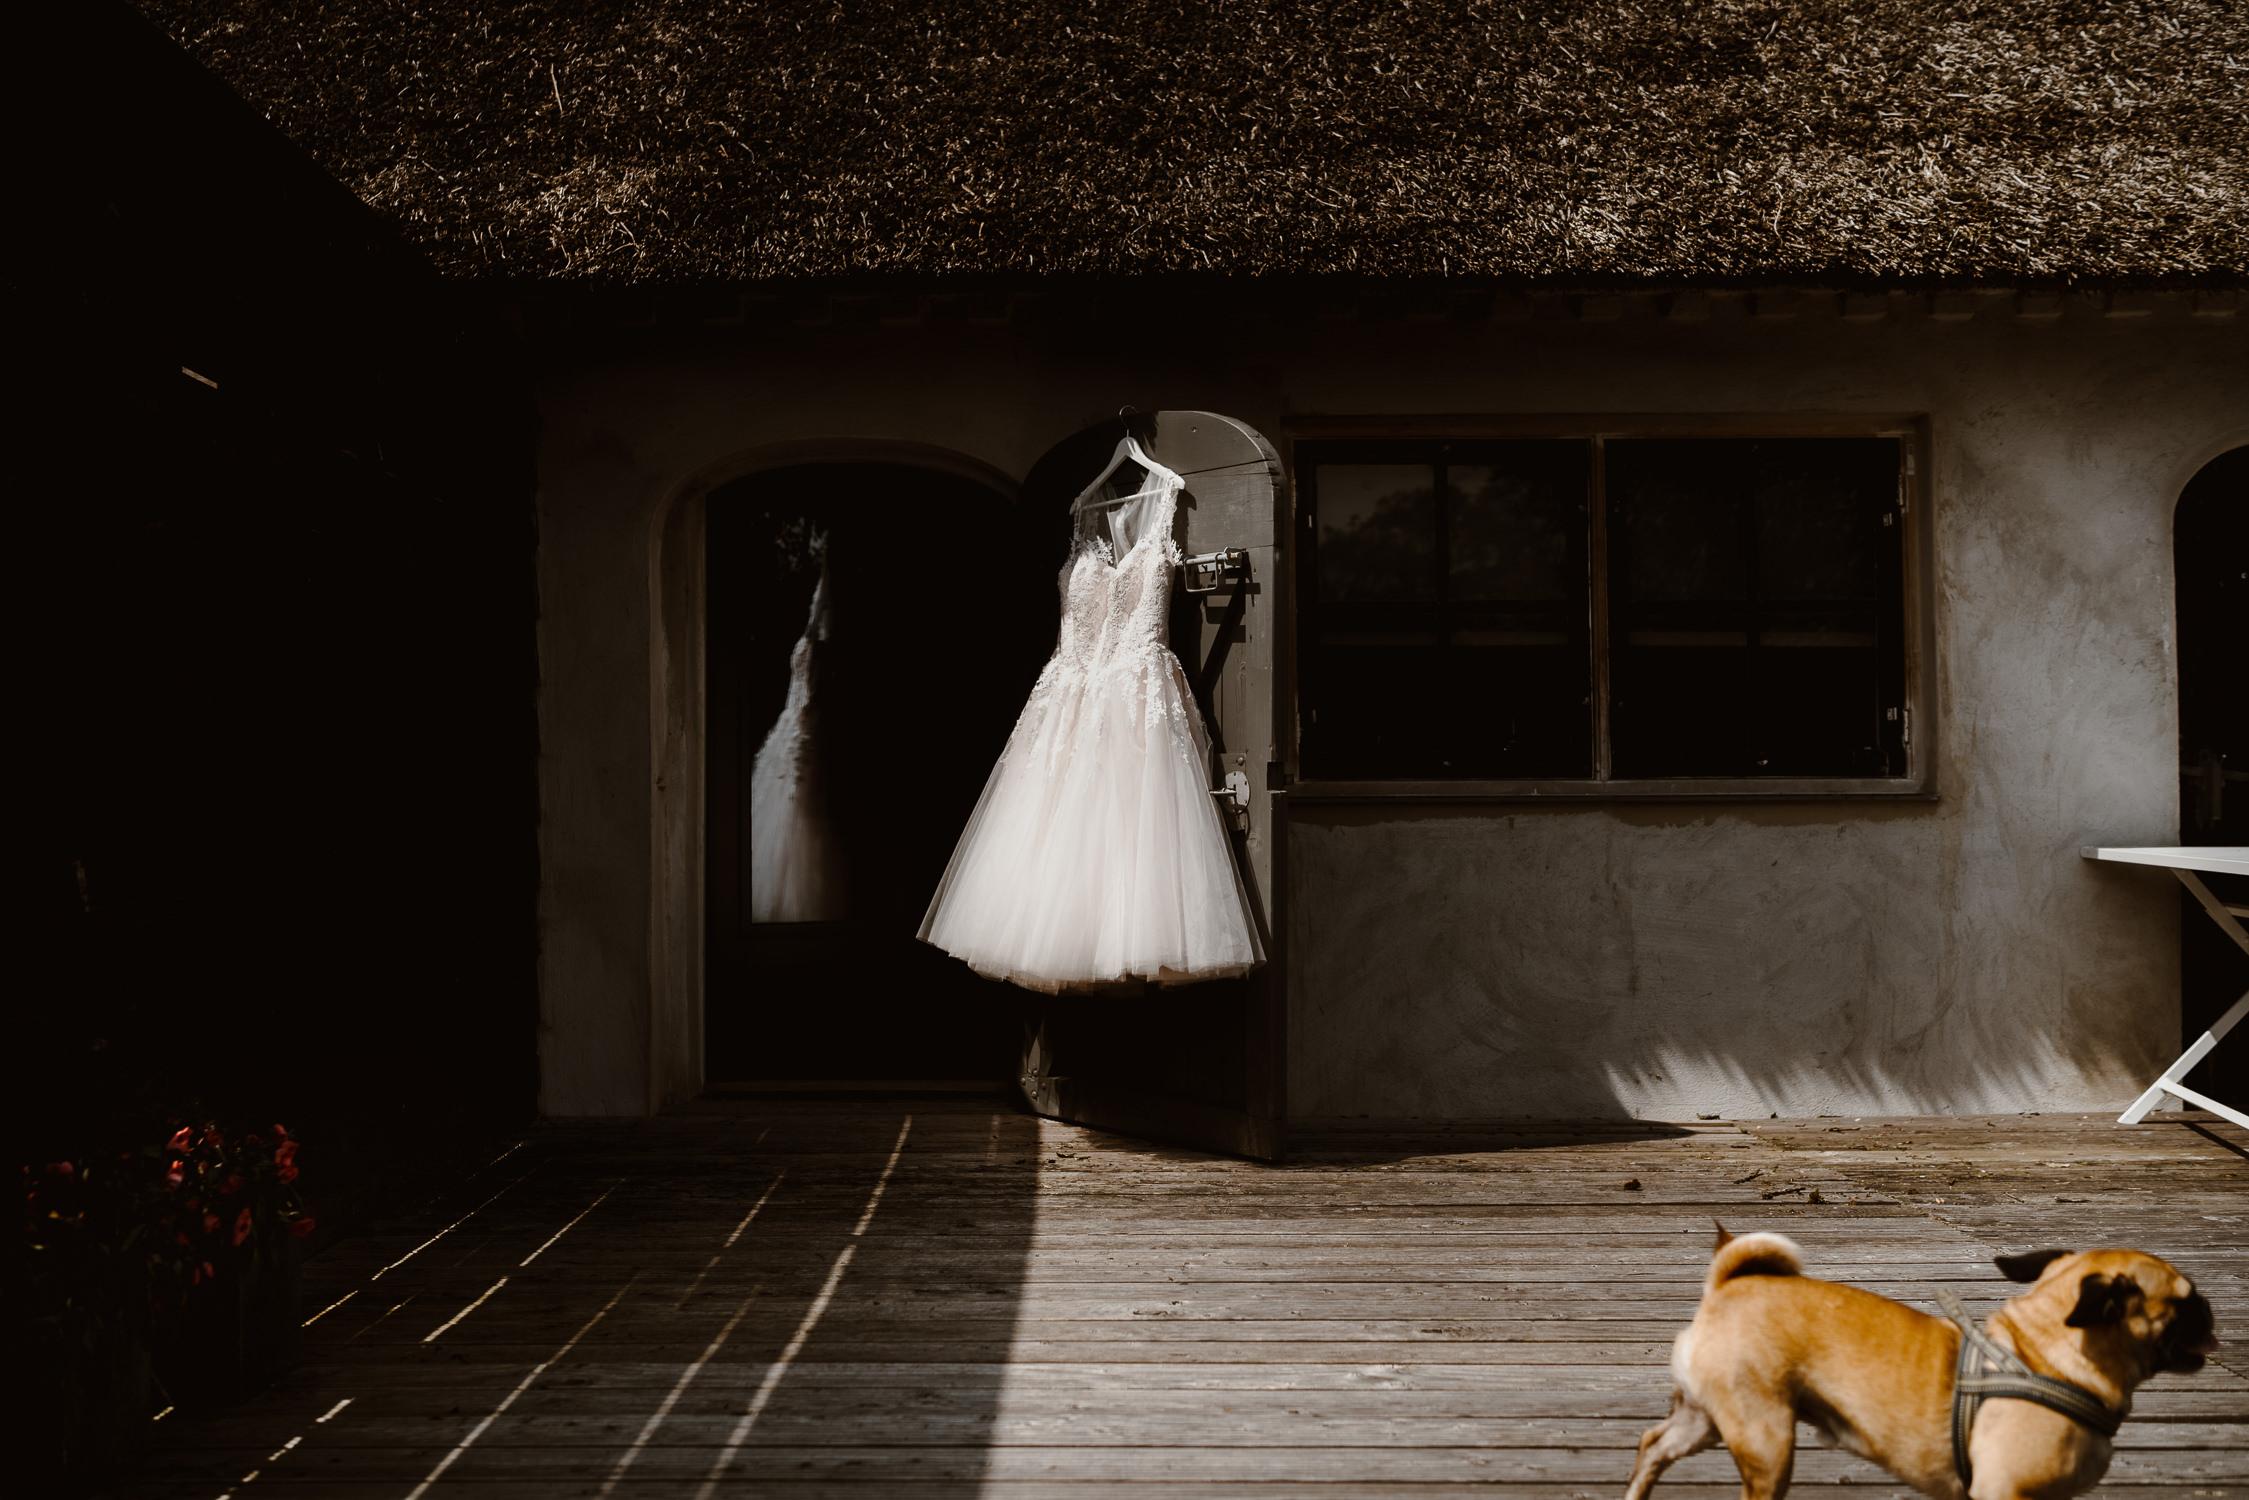 wedding dress by best amsterdam wedding photographers mark hadden